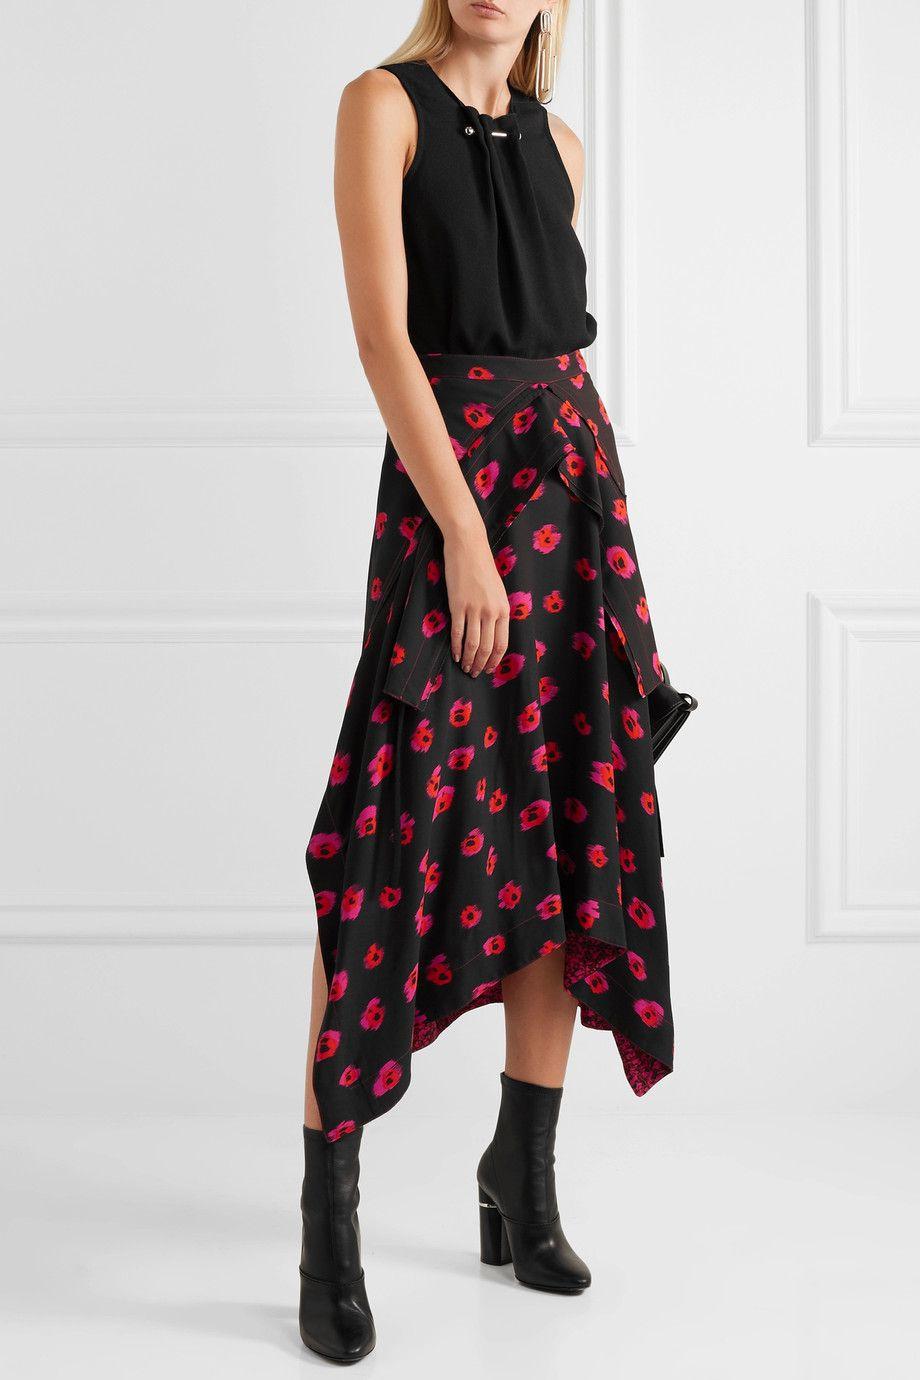 Proenza Schouler printed floral skirt